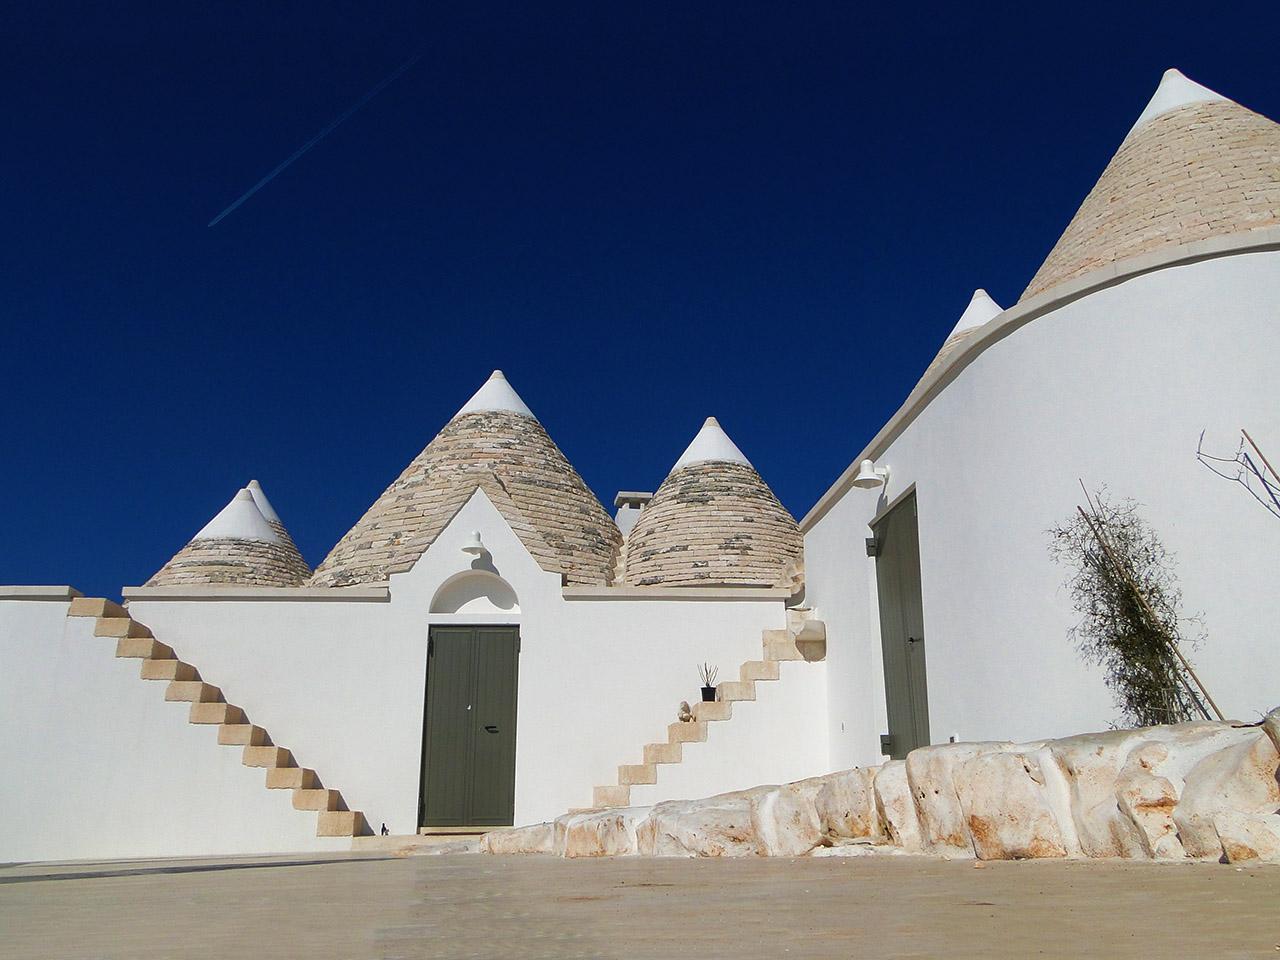 costruzioni restauri sirio ostuni residenza privata montesasso ostuni dsc00046